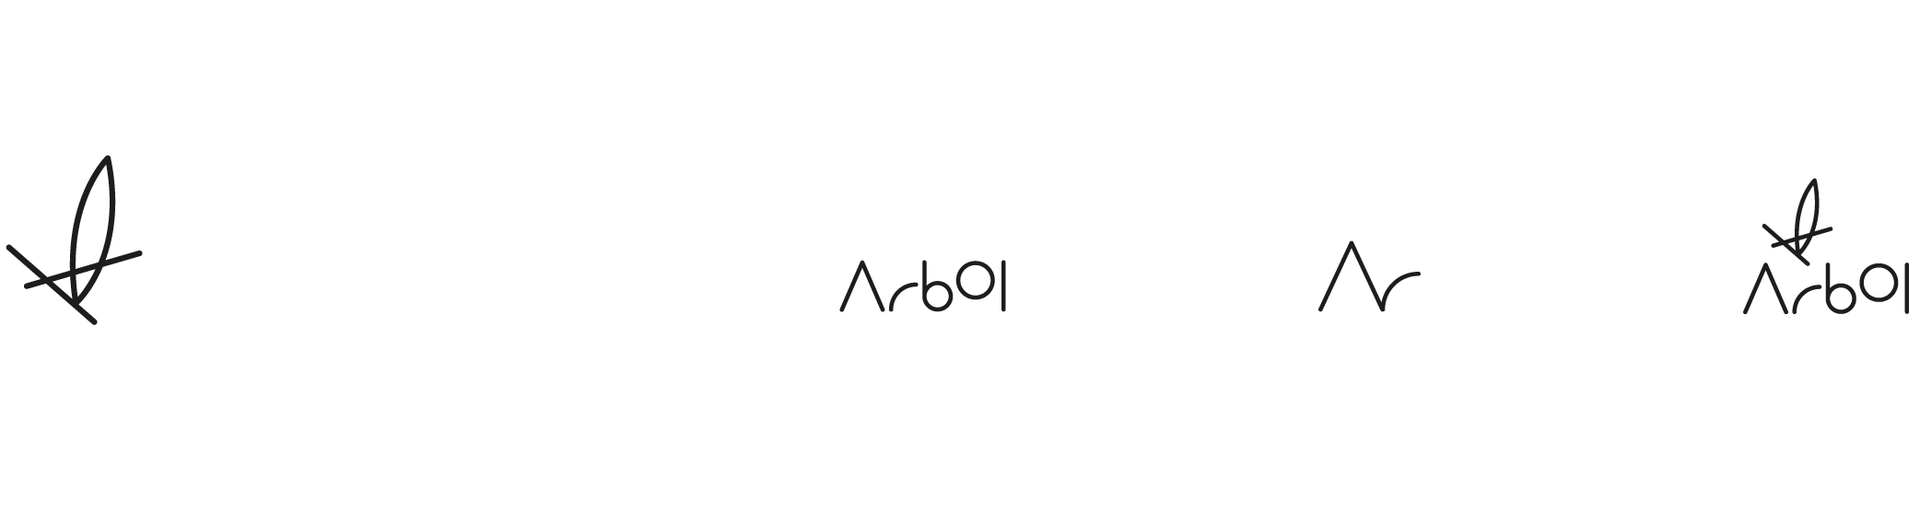 apoc_studio_gustavo_francesconi_logos_49